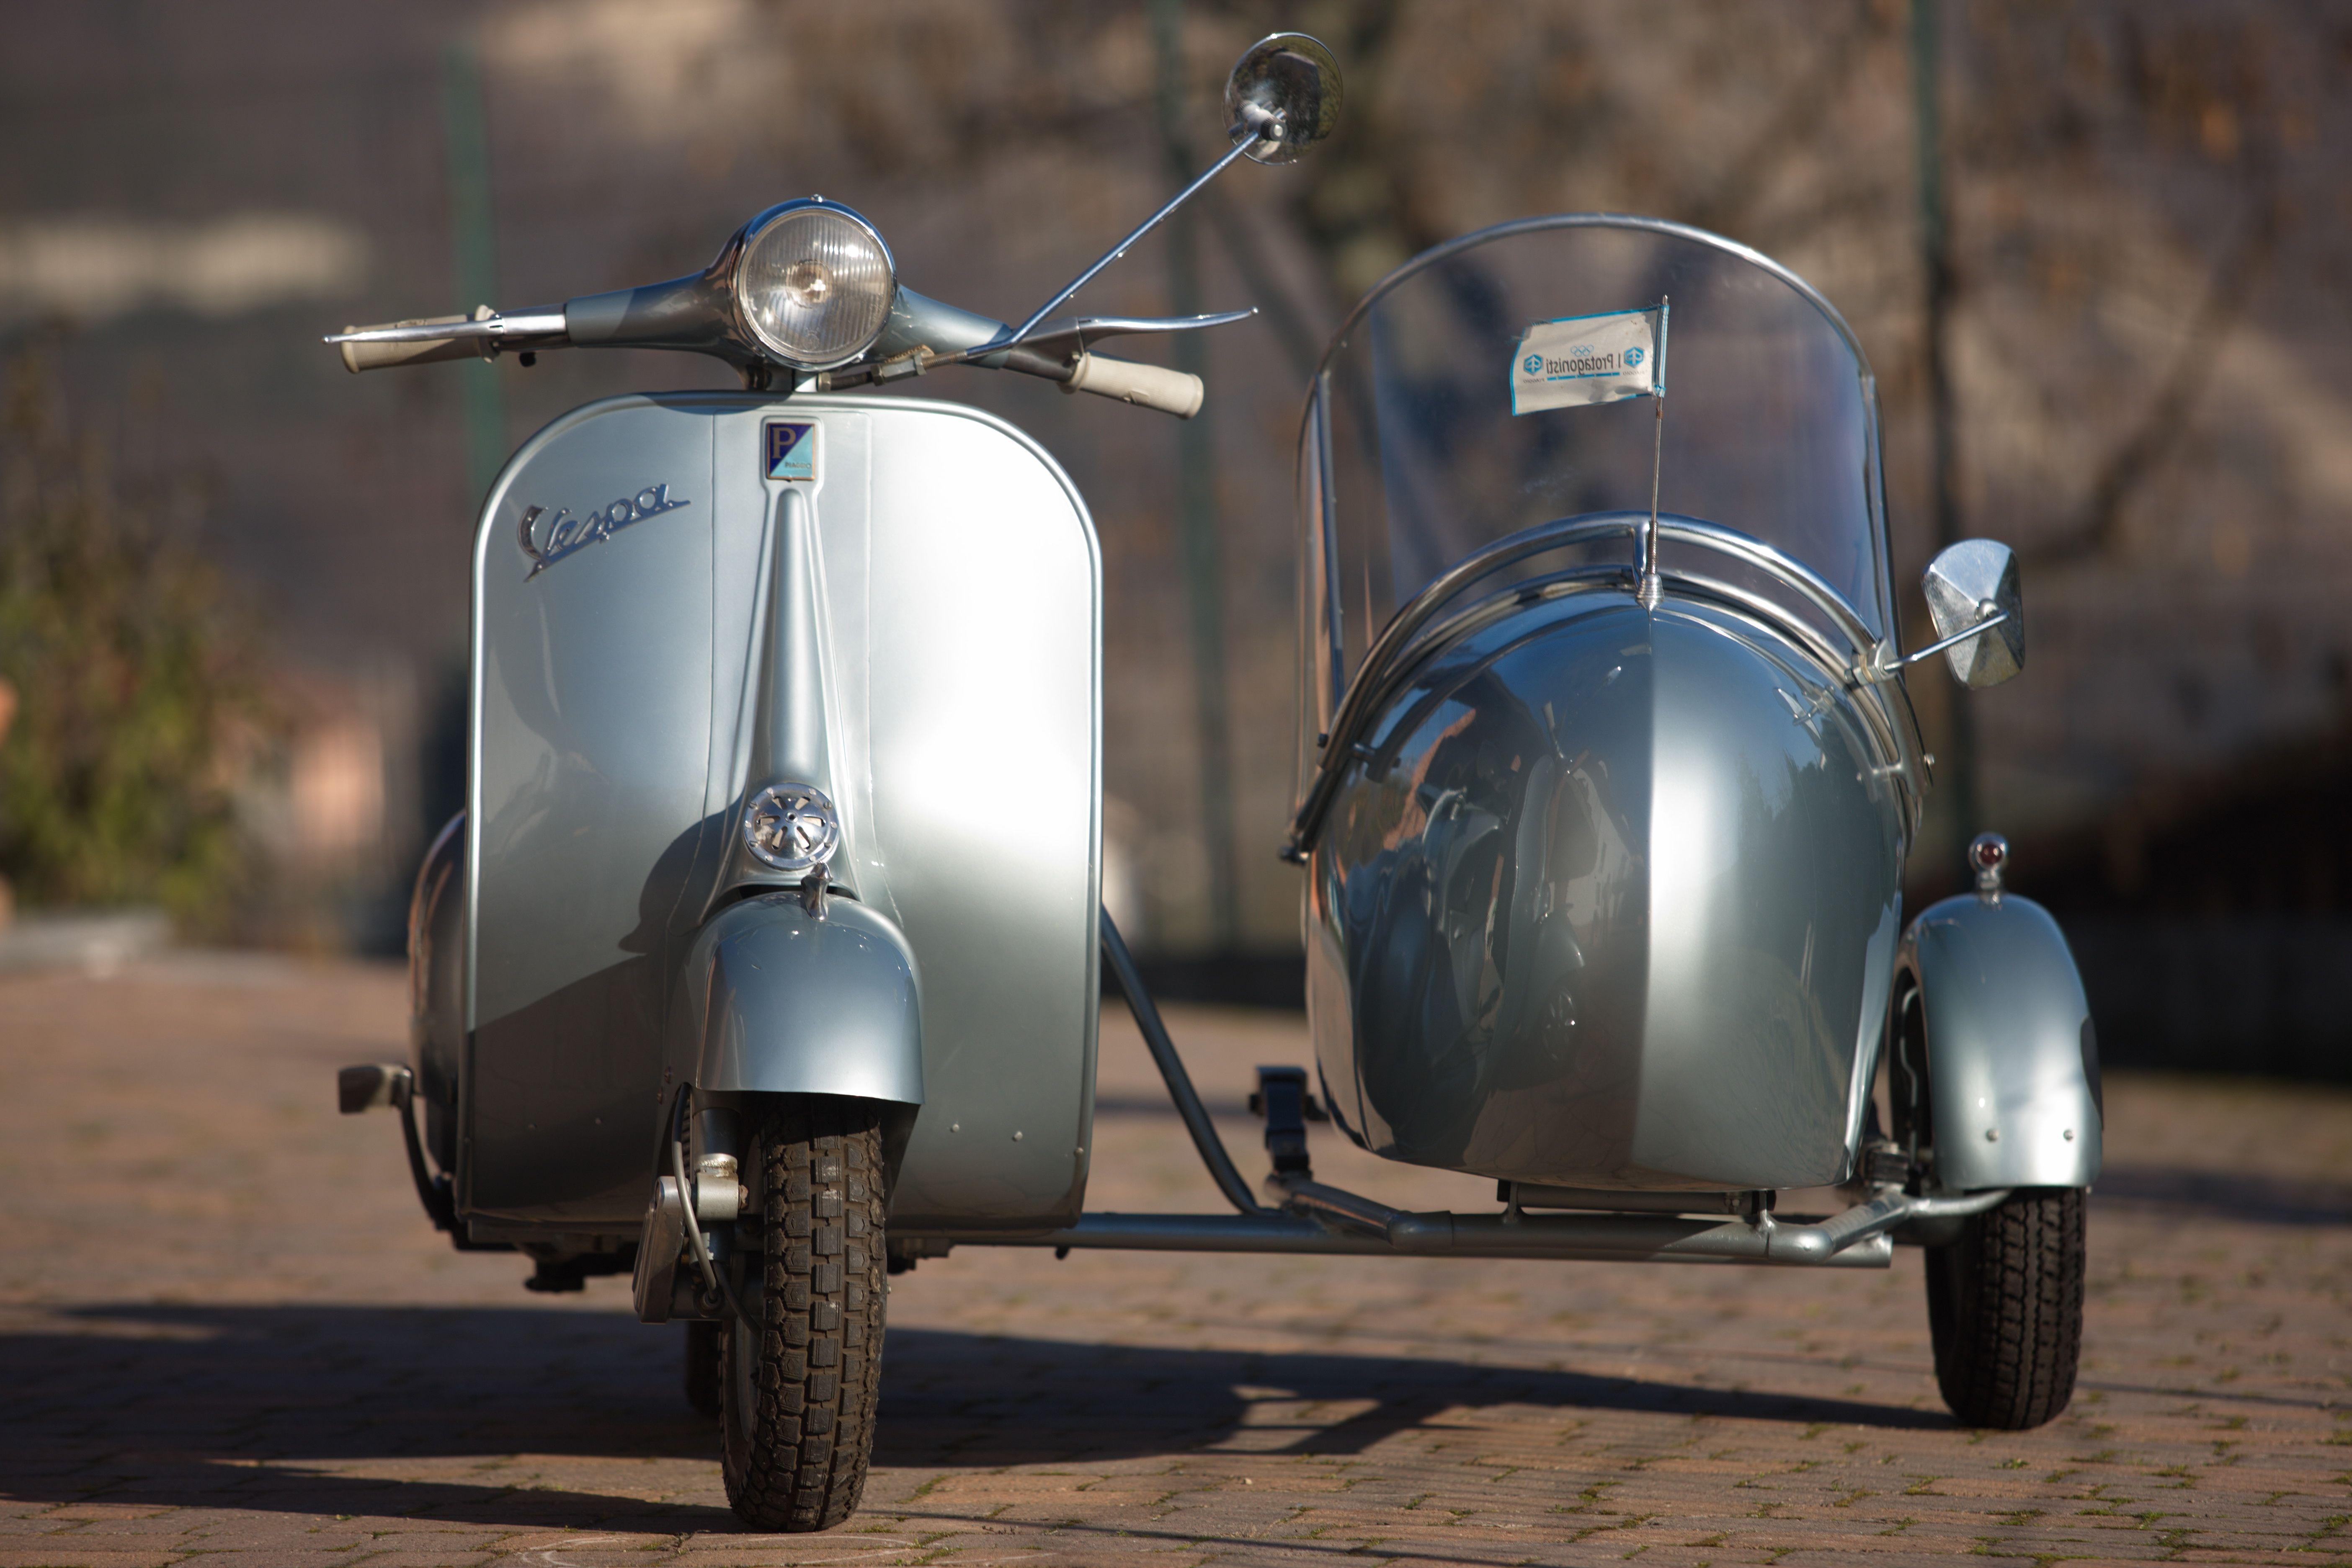 Autos Motorräder Auktion Motorräder Reise Vespa 150 Circulation Motorcycles Travel